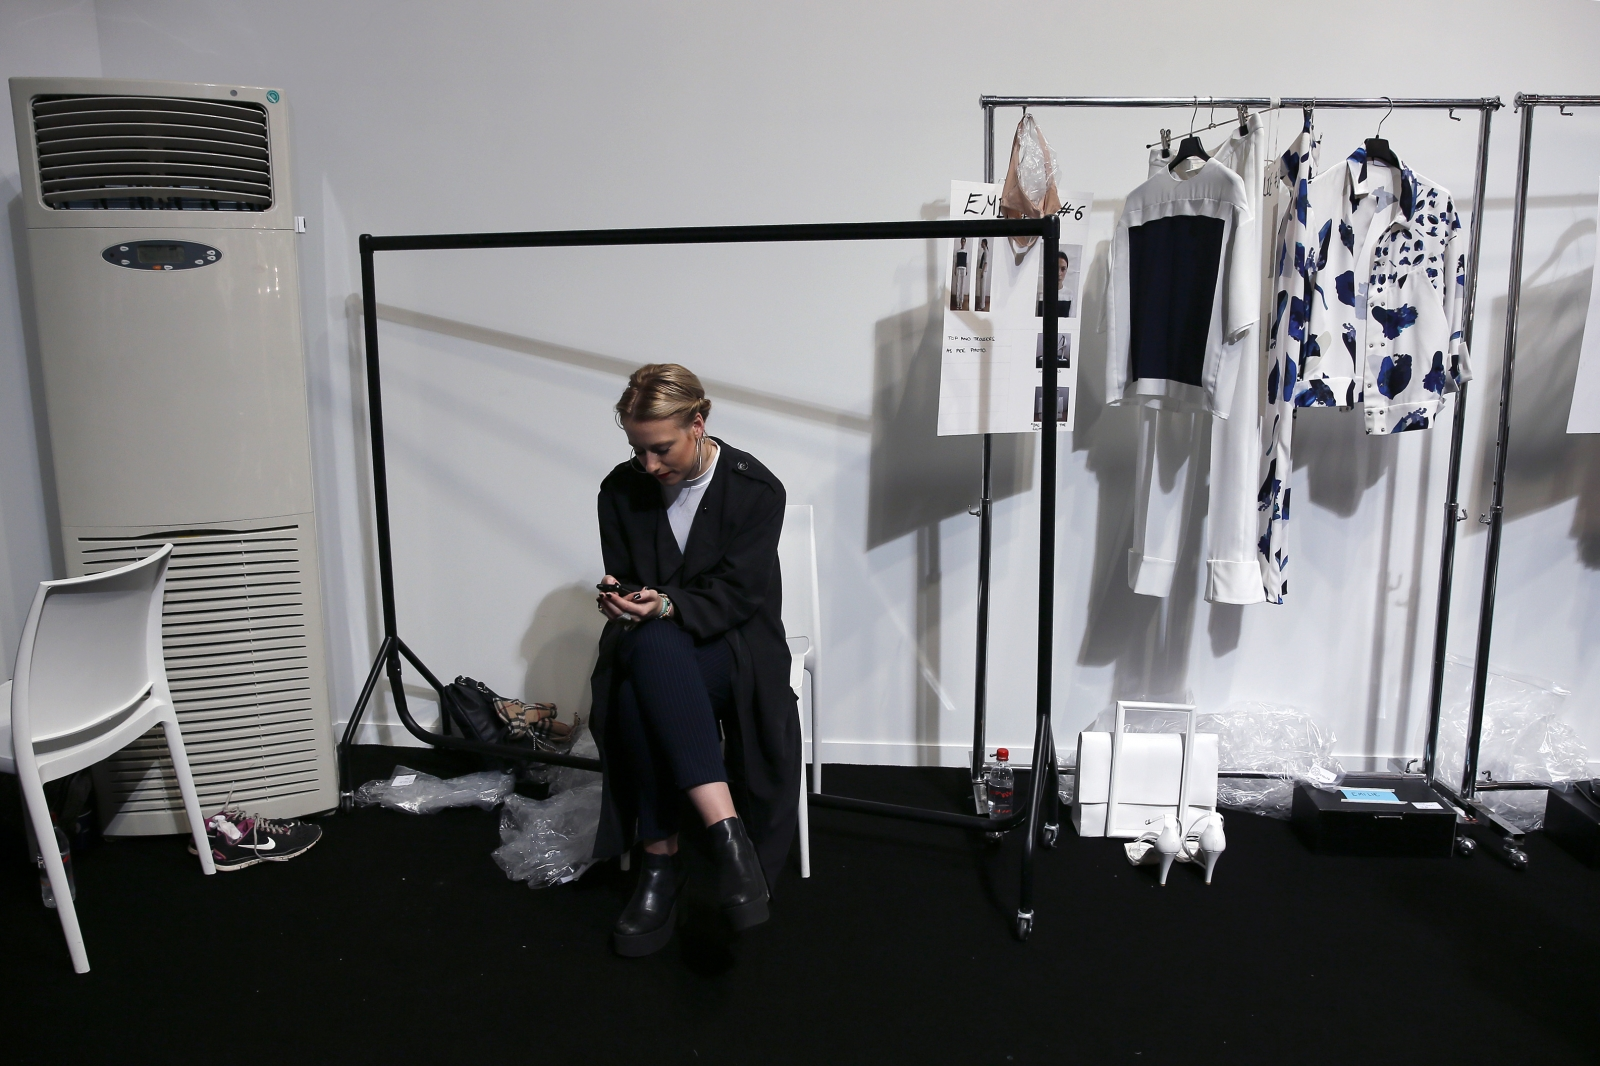 London Fashion Week - Day 1 - 05